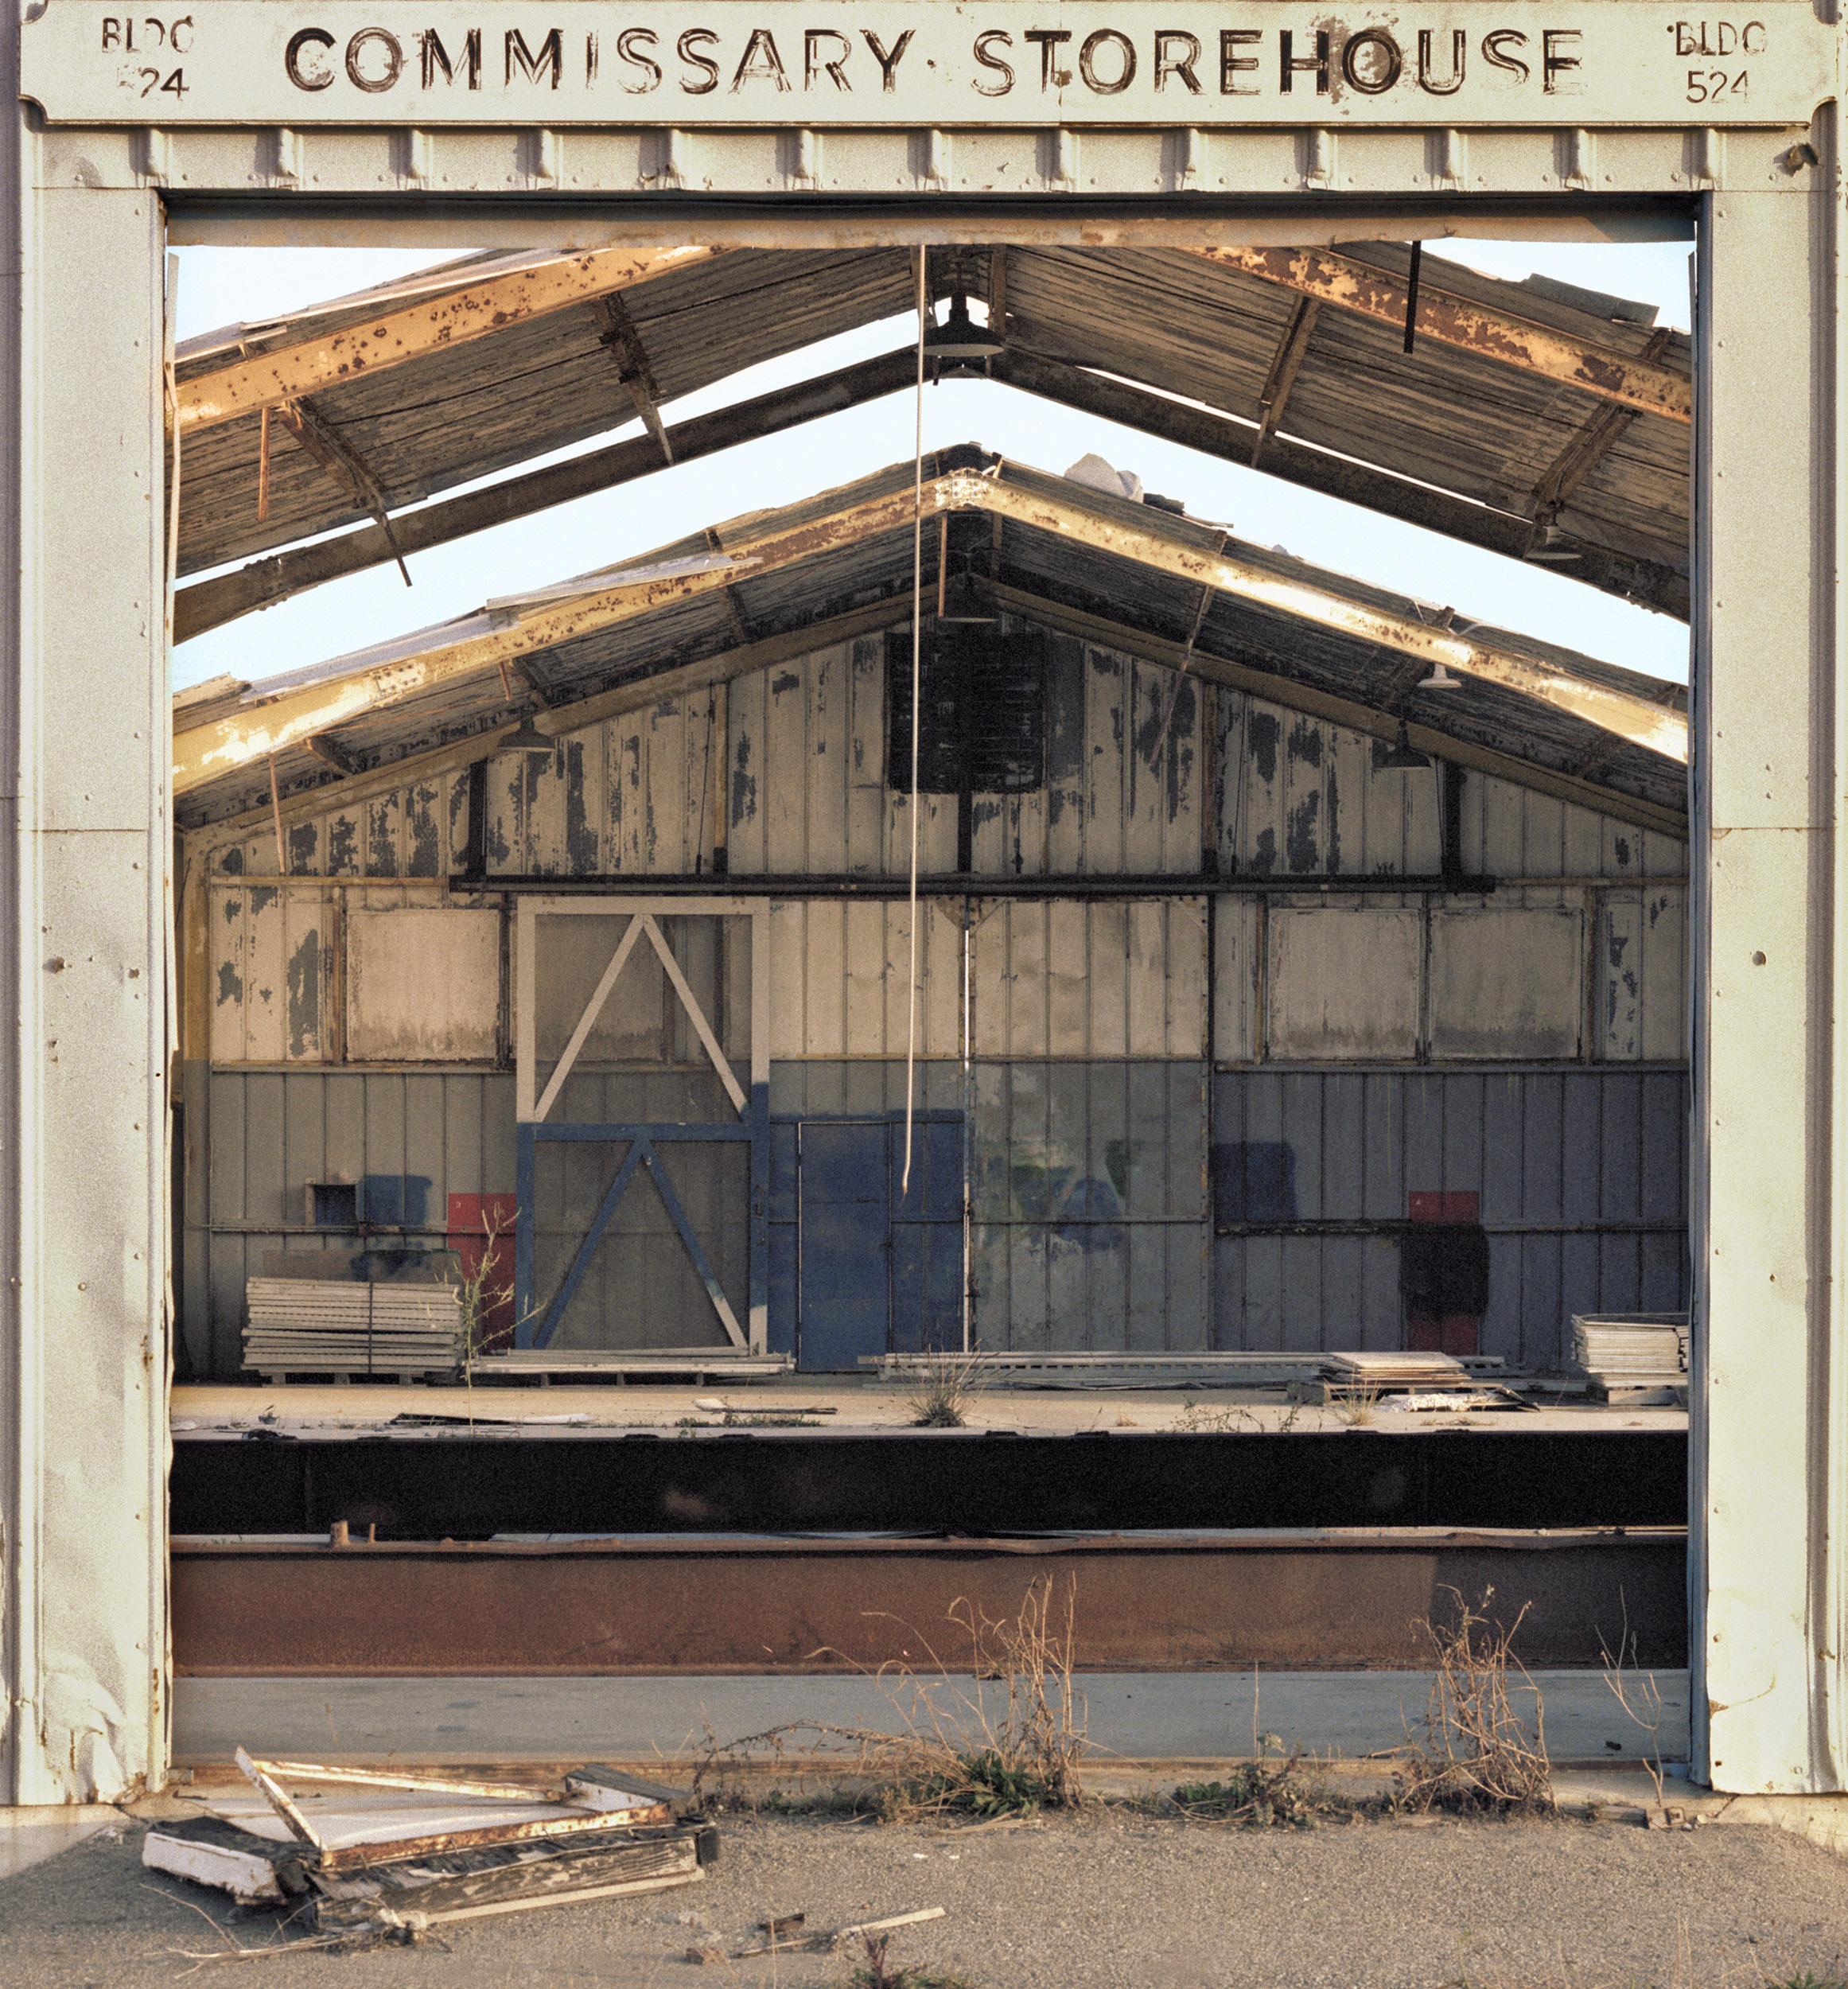 Commissary Storehouse, Hunter's Point